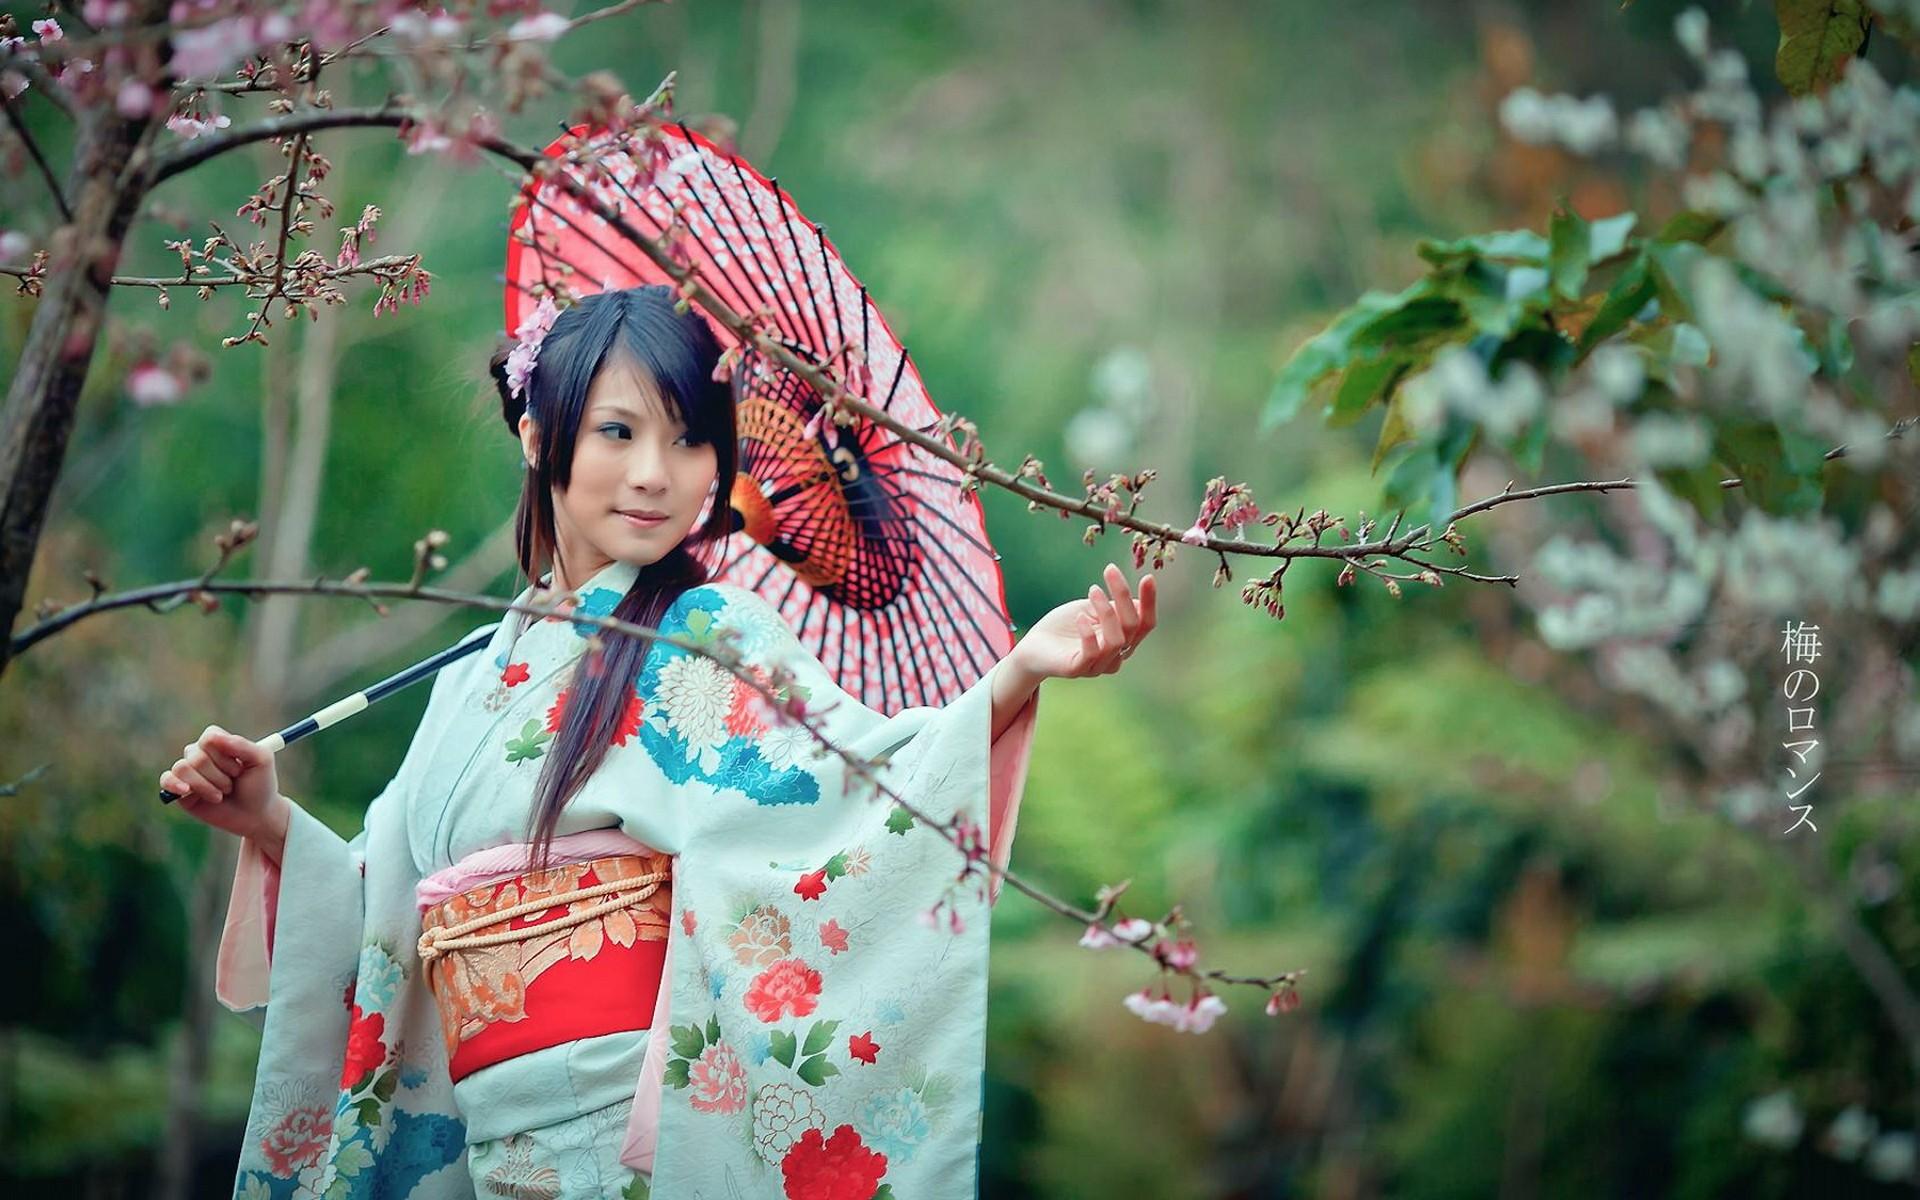 http://uupload.ir/files/zhej_japon-wom.jpg